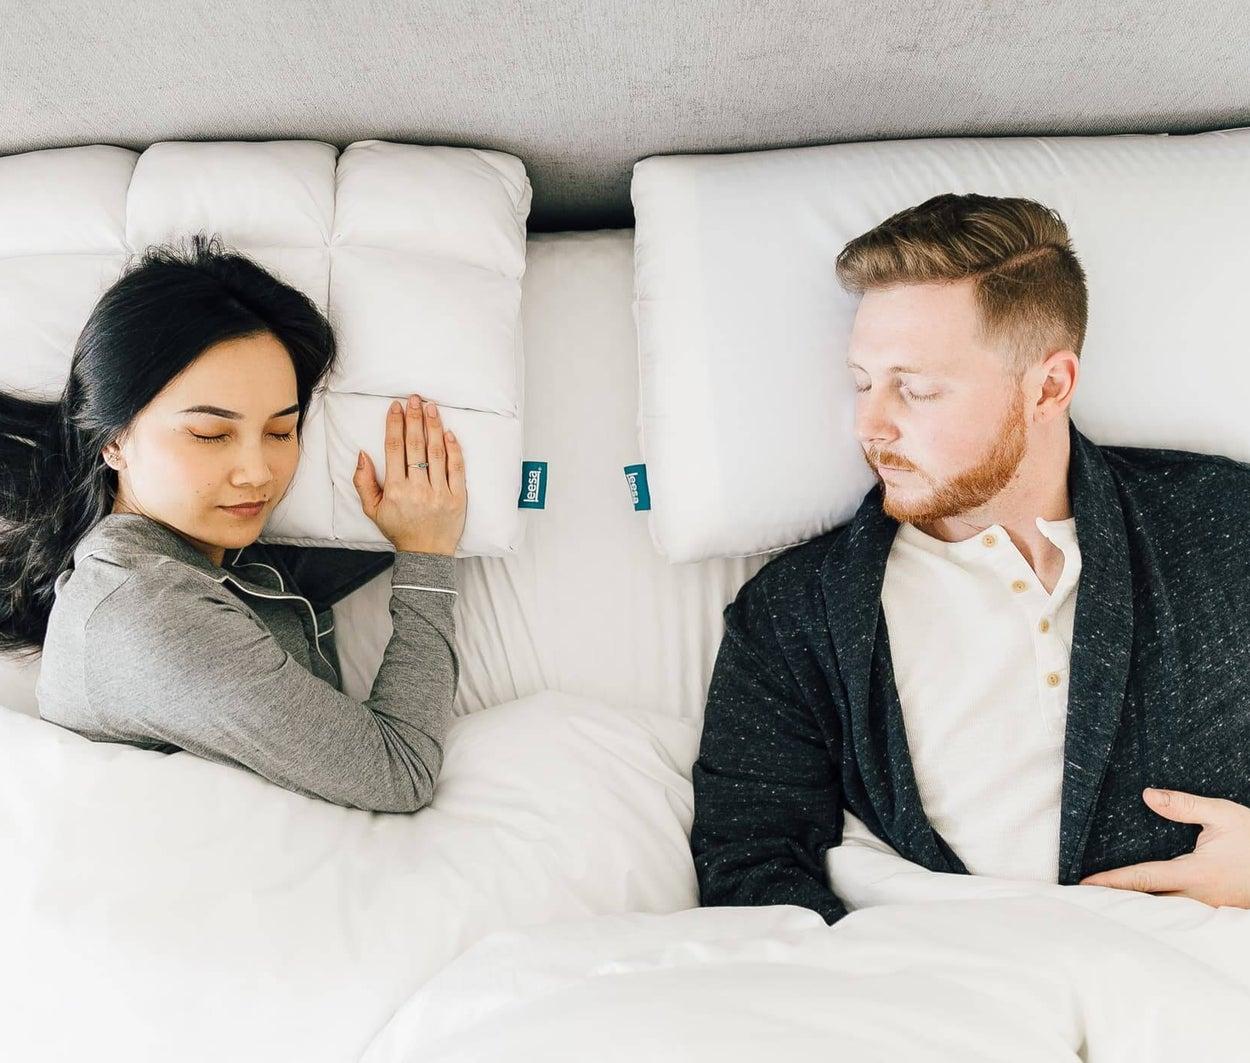 Hybrid pillow 1